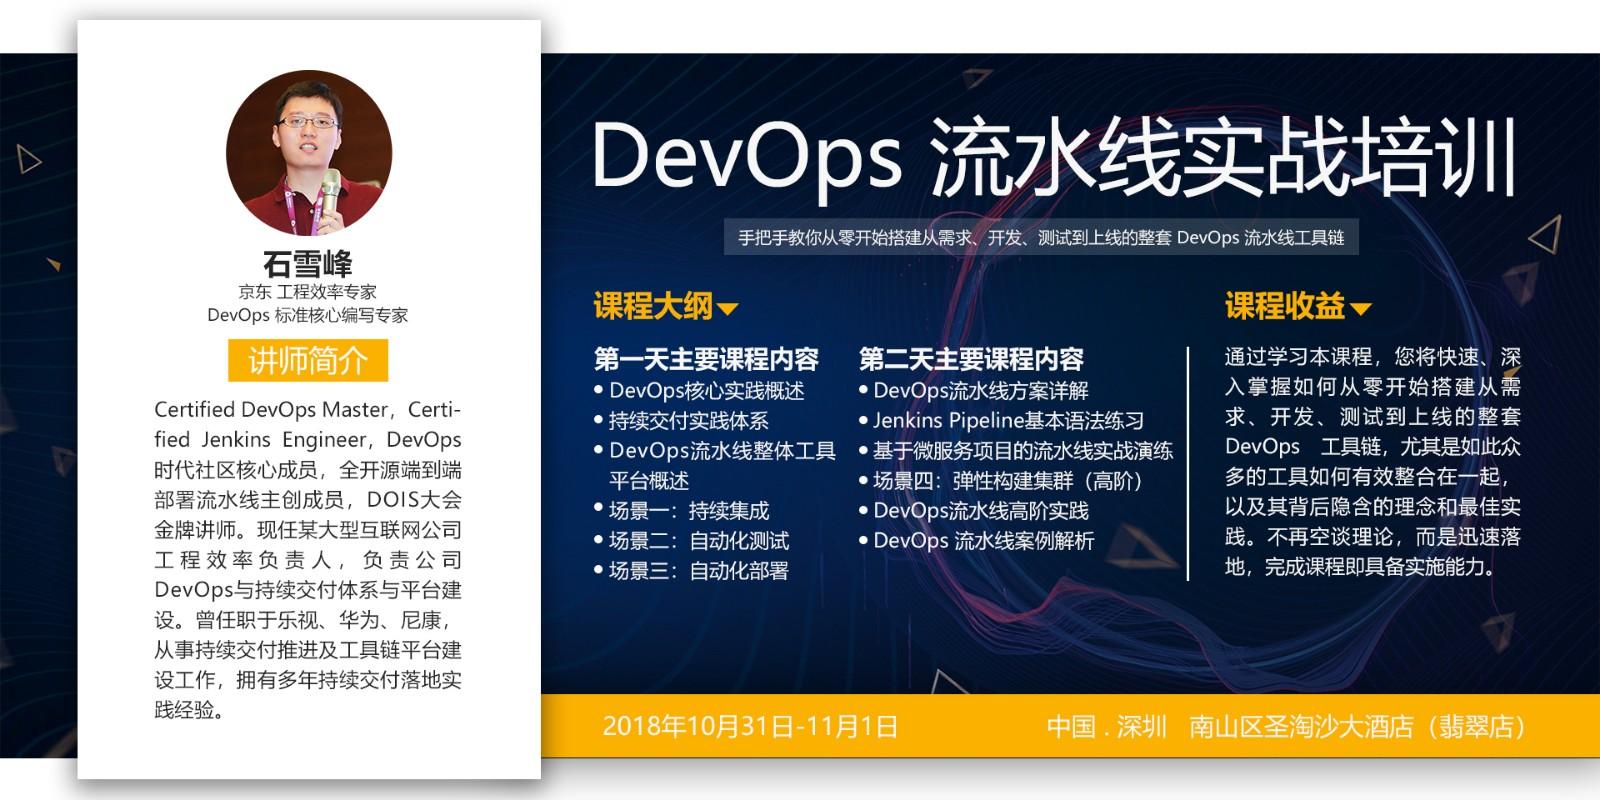 DevOps国际峰会暨DevOps金融峰会2018·深圳(DOIS)